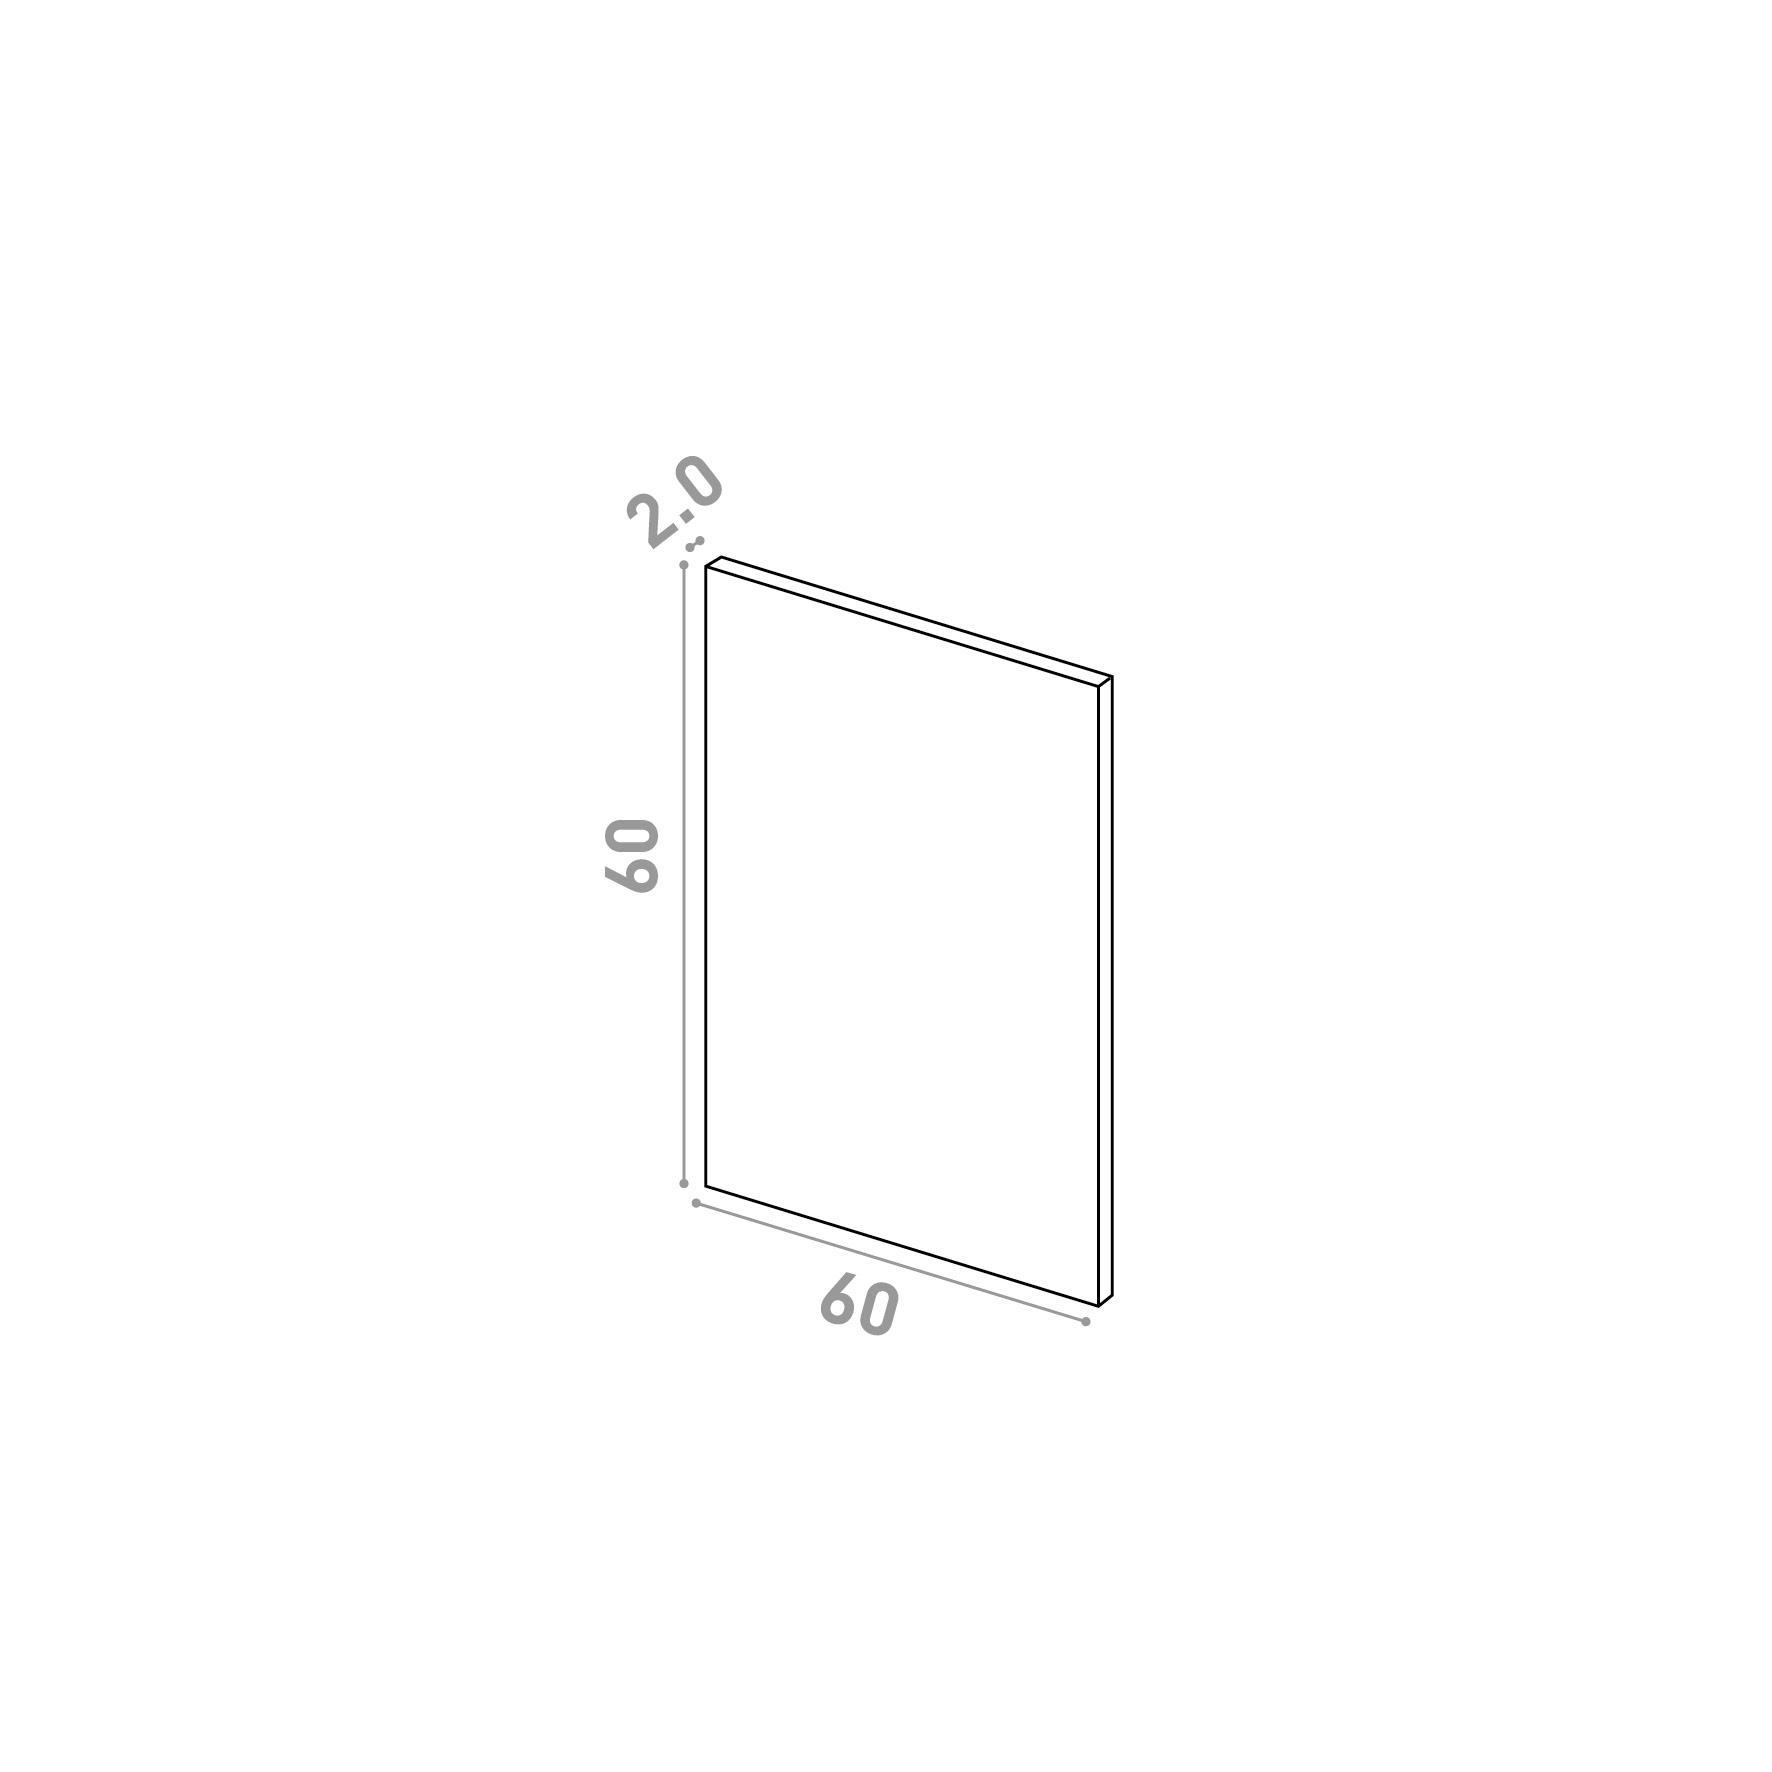 Porte 60X60cm   design lisse   chêne naturel